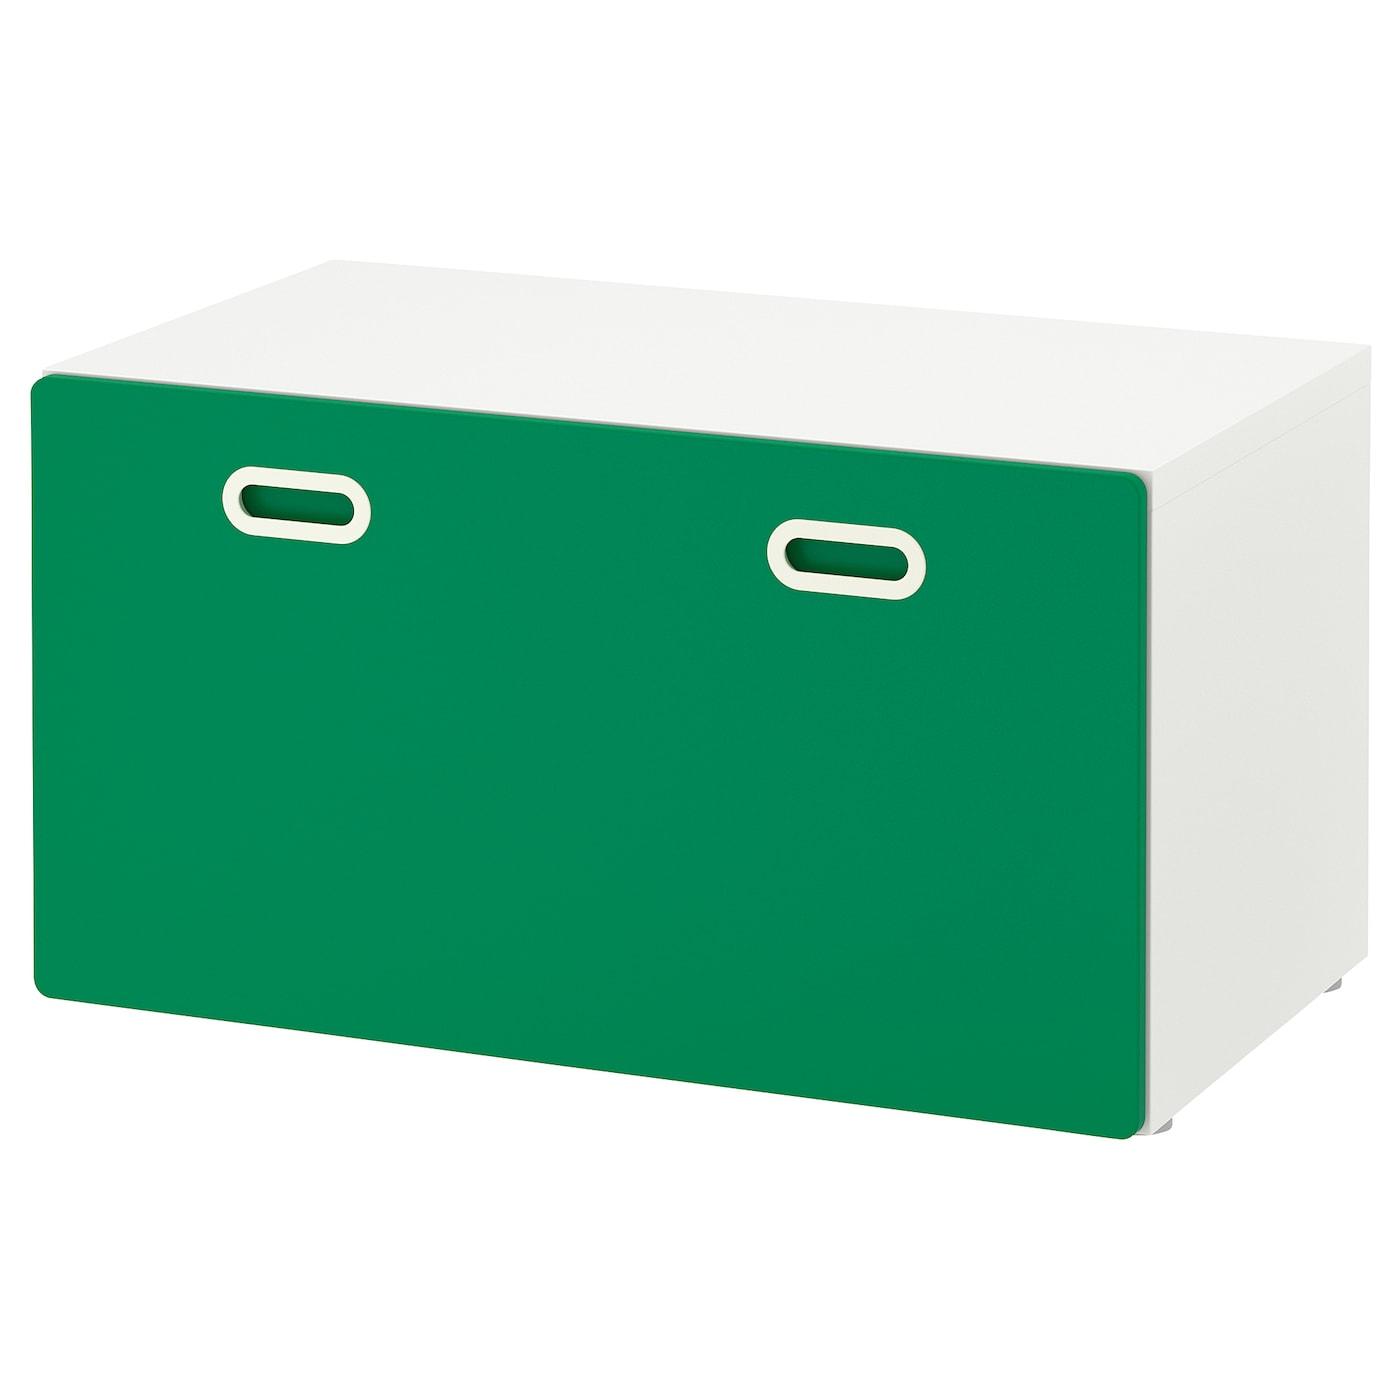 limited com walmart ip box toy bench cherry edition kidkraft